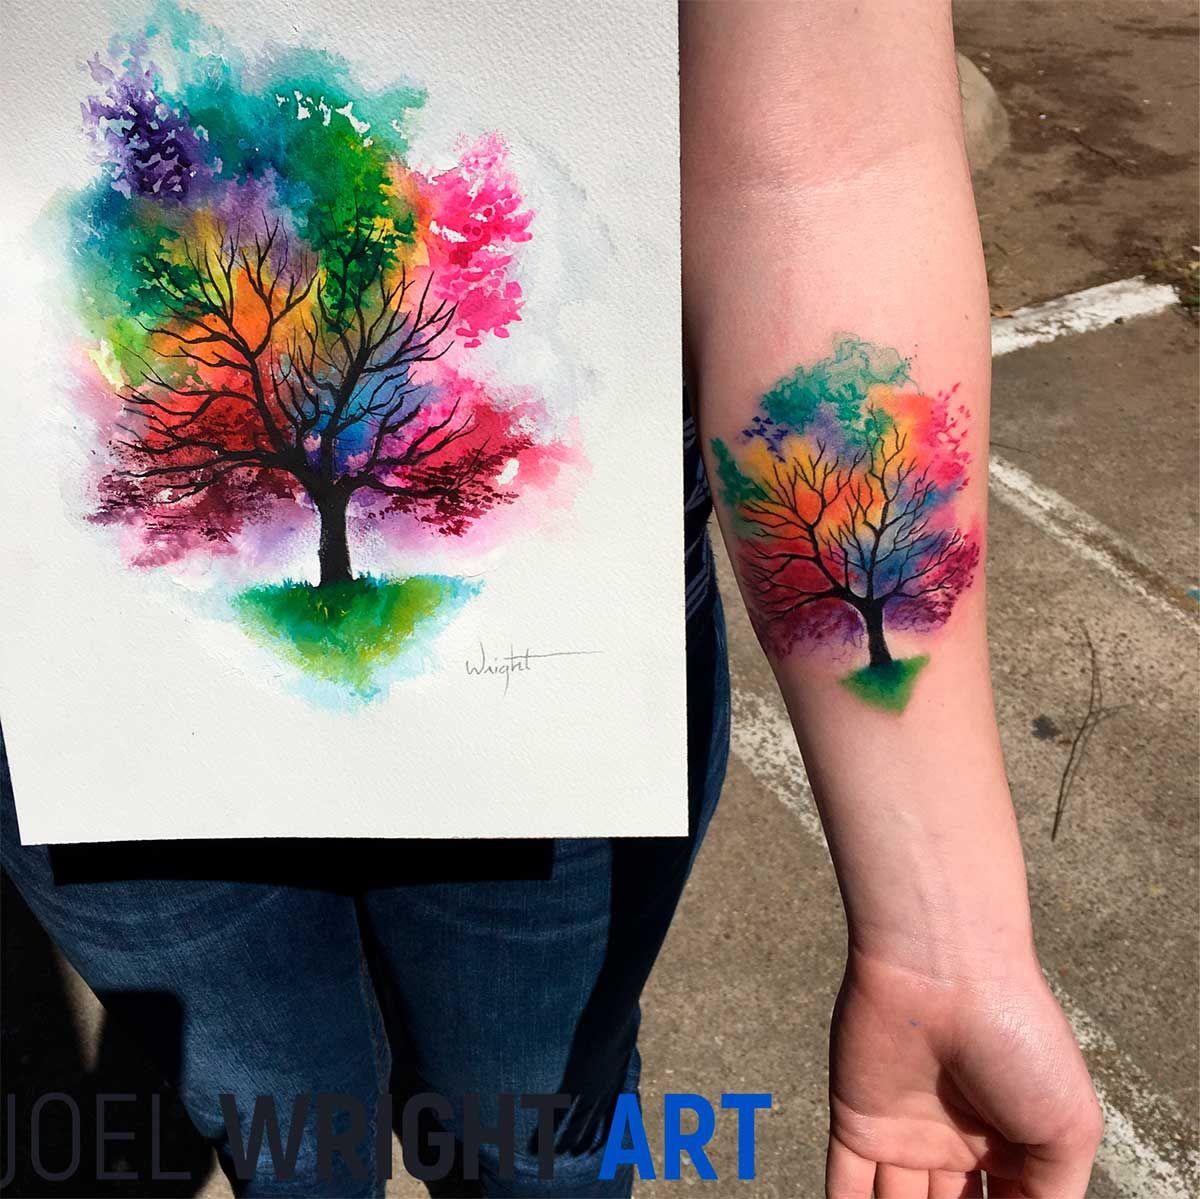 Watercolor Tattoos Last This Long